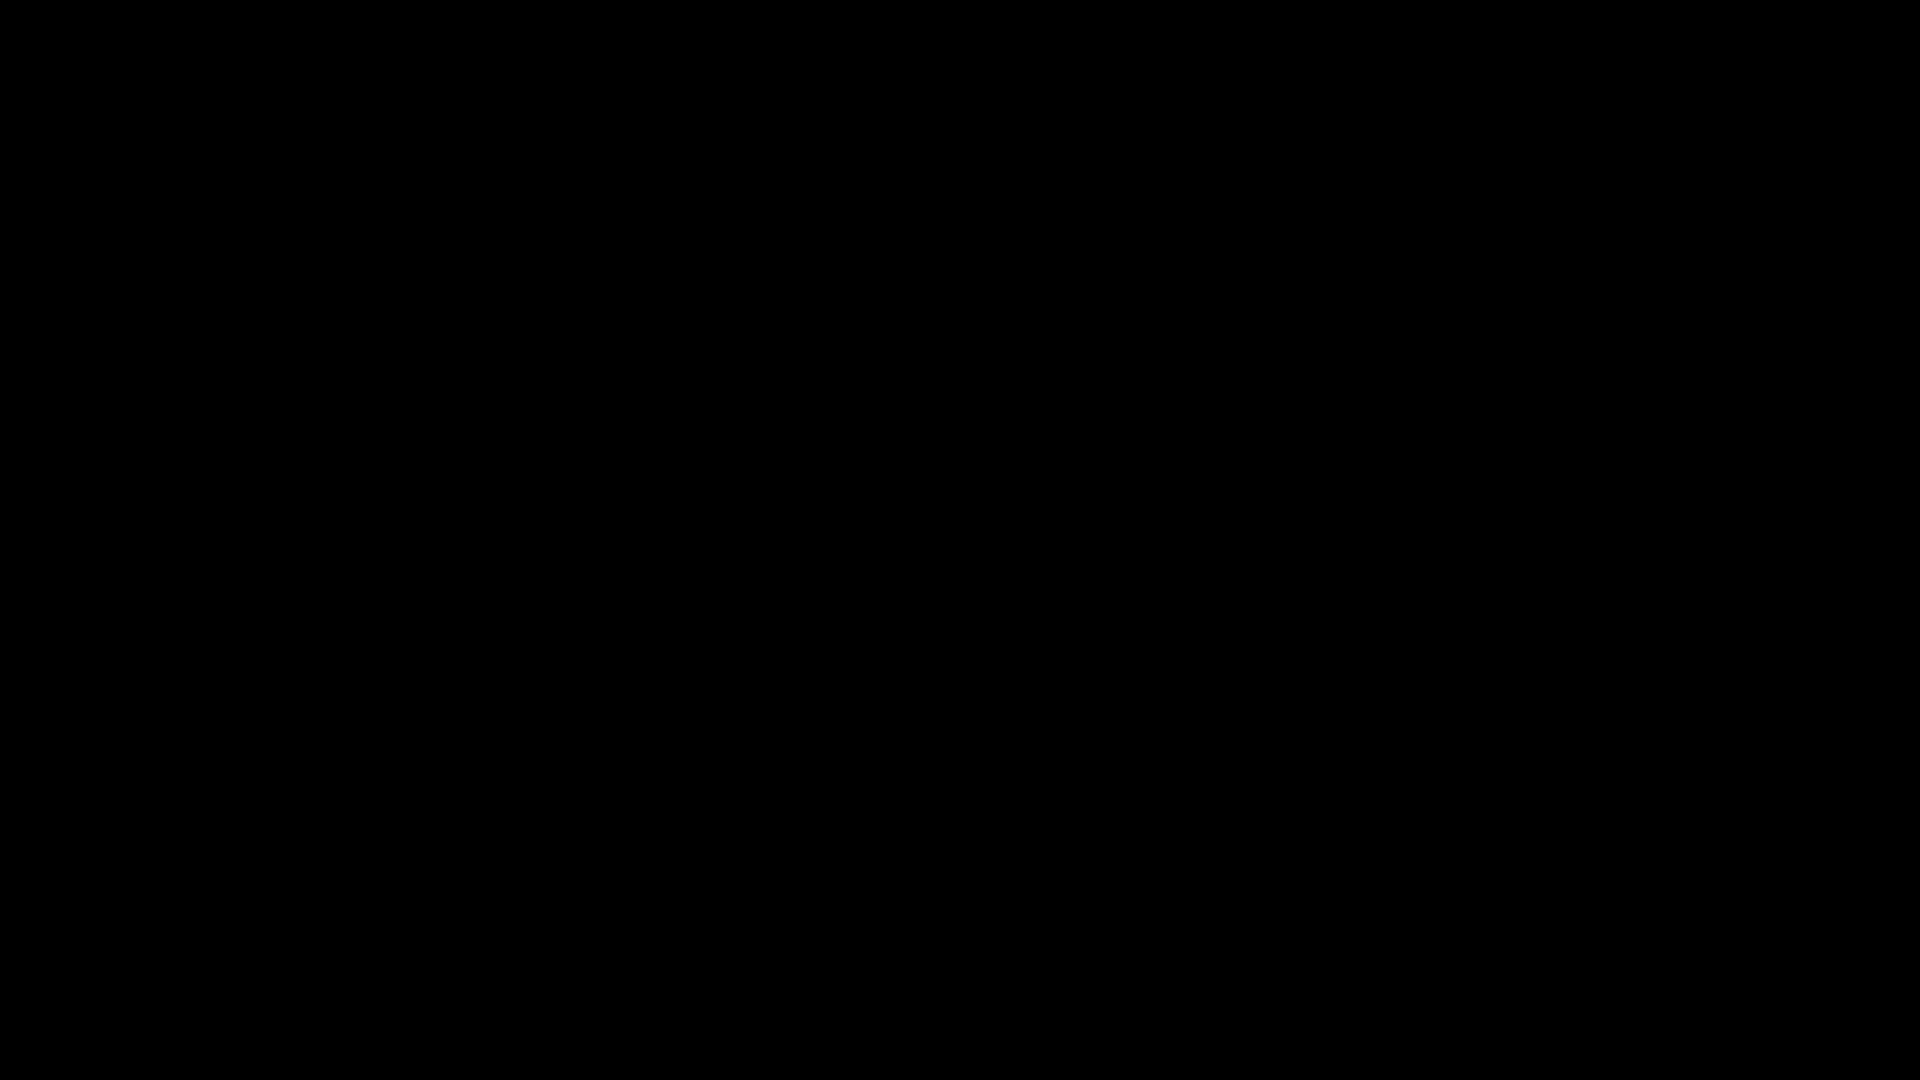 1.000 CAM İLE EGG KAPLAMAK !!! | Minecraft: EGG WARS BKT, 1.000 cam ile egg wars, 1000 cam ile eggi kaplamak, Baran Kadir Tekin, Baran Kadir Tekin minecraft, Minecraft, Troll, baran kadir egg wars, baran kadir tekin egg wars, bedwars, bkt egg wars, eggwars, minecraft egg wars, minecraft mod, minecraft modlu survival, minecraft türkçe, mod, türkçe minecraft, yumurta savaşları, 1.000 CAM İLE EGG KAPLAMAK !!! | Minecraft: EGG WARS BKT GIFs